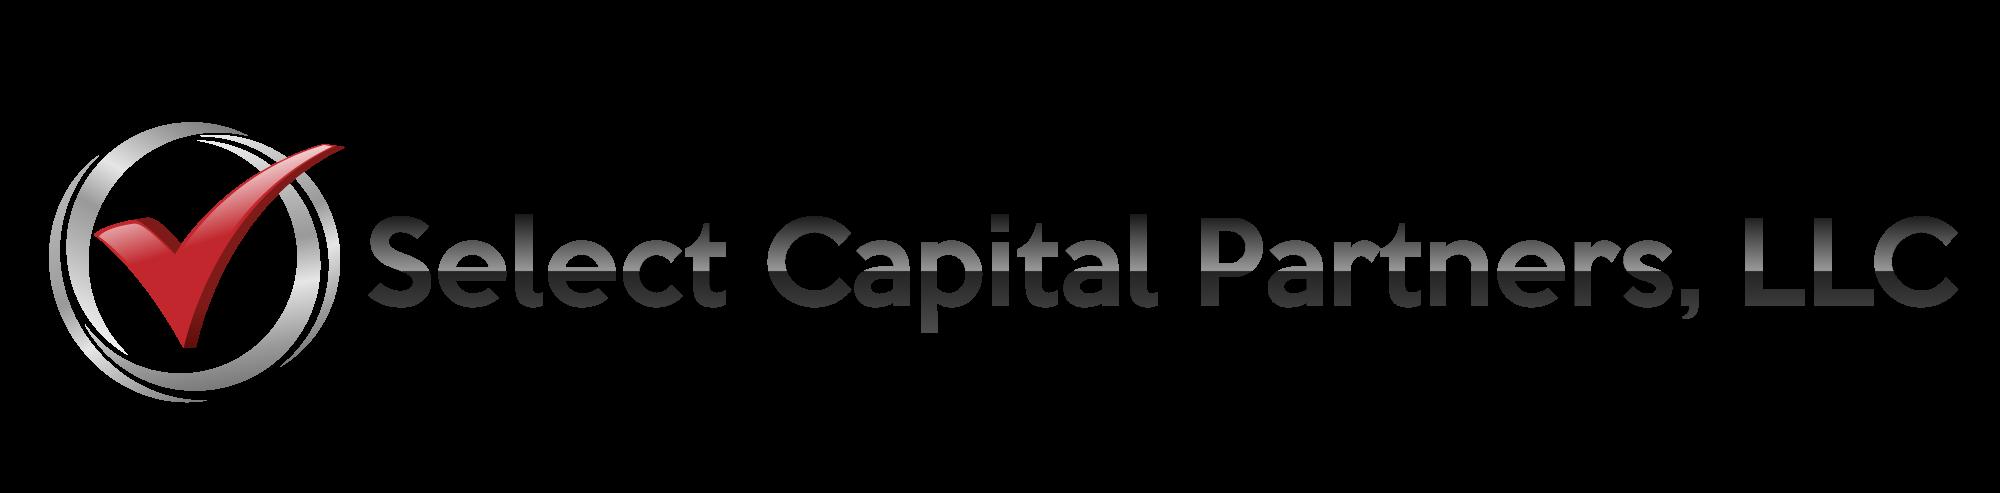 Select Capital Partners, LLC